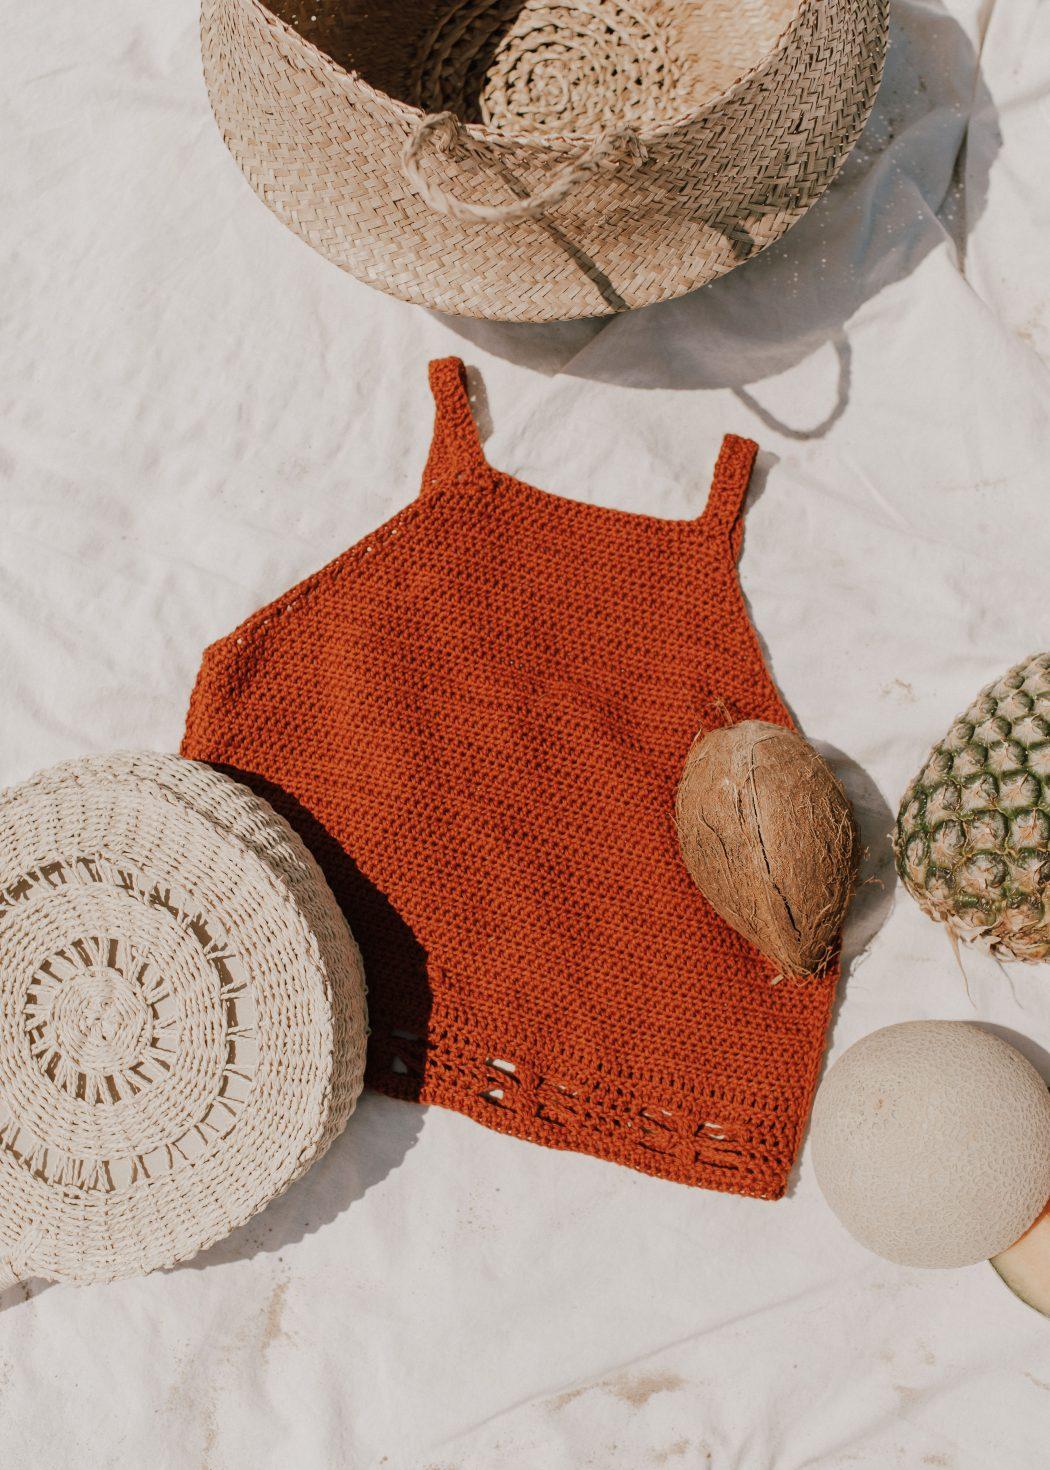 crochet-bikini-pattern-38-beach-free-crochet-swimwear-pattern-design-ideas-for-this-year-new-2019